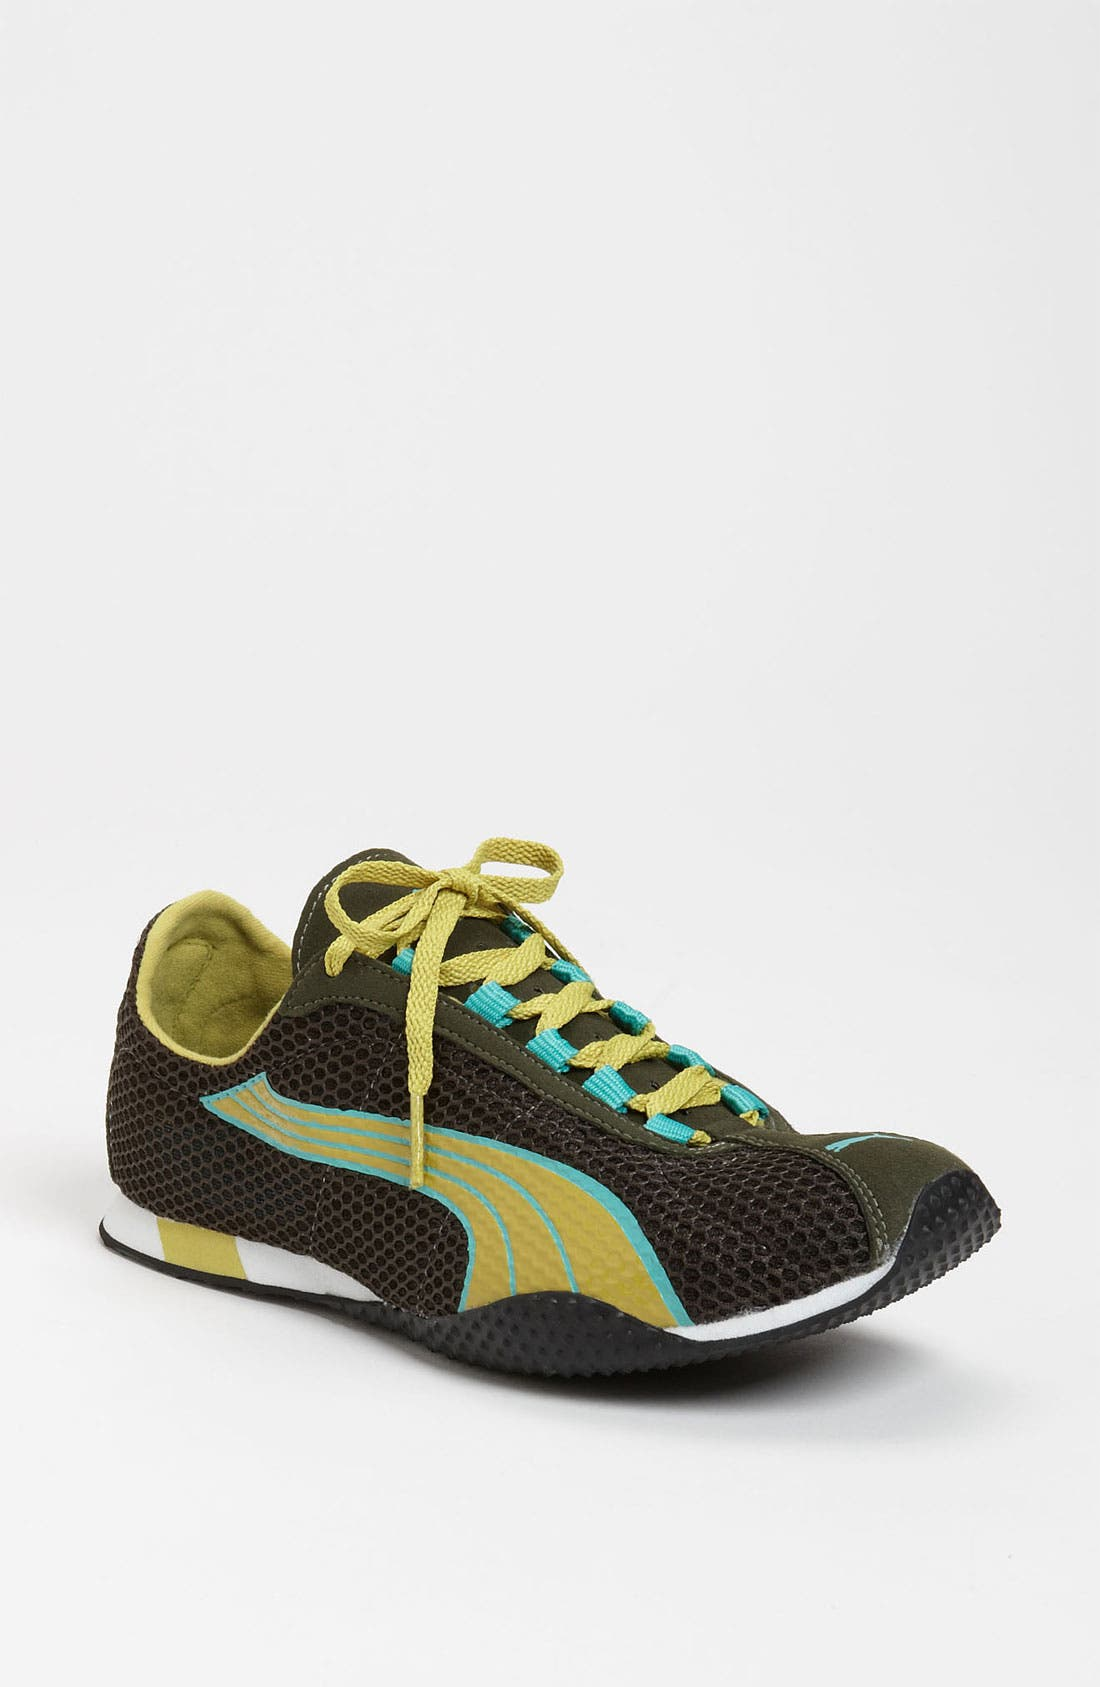 Main Image - PUMA 'H Street NM' Active Shoe (Women)